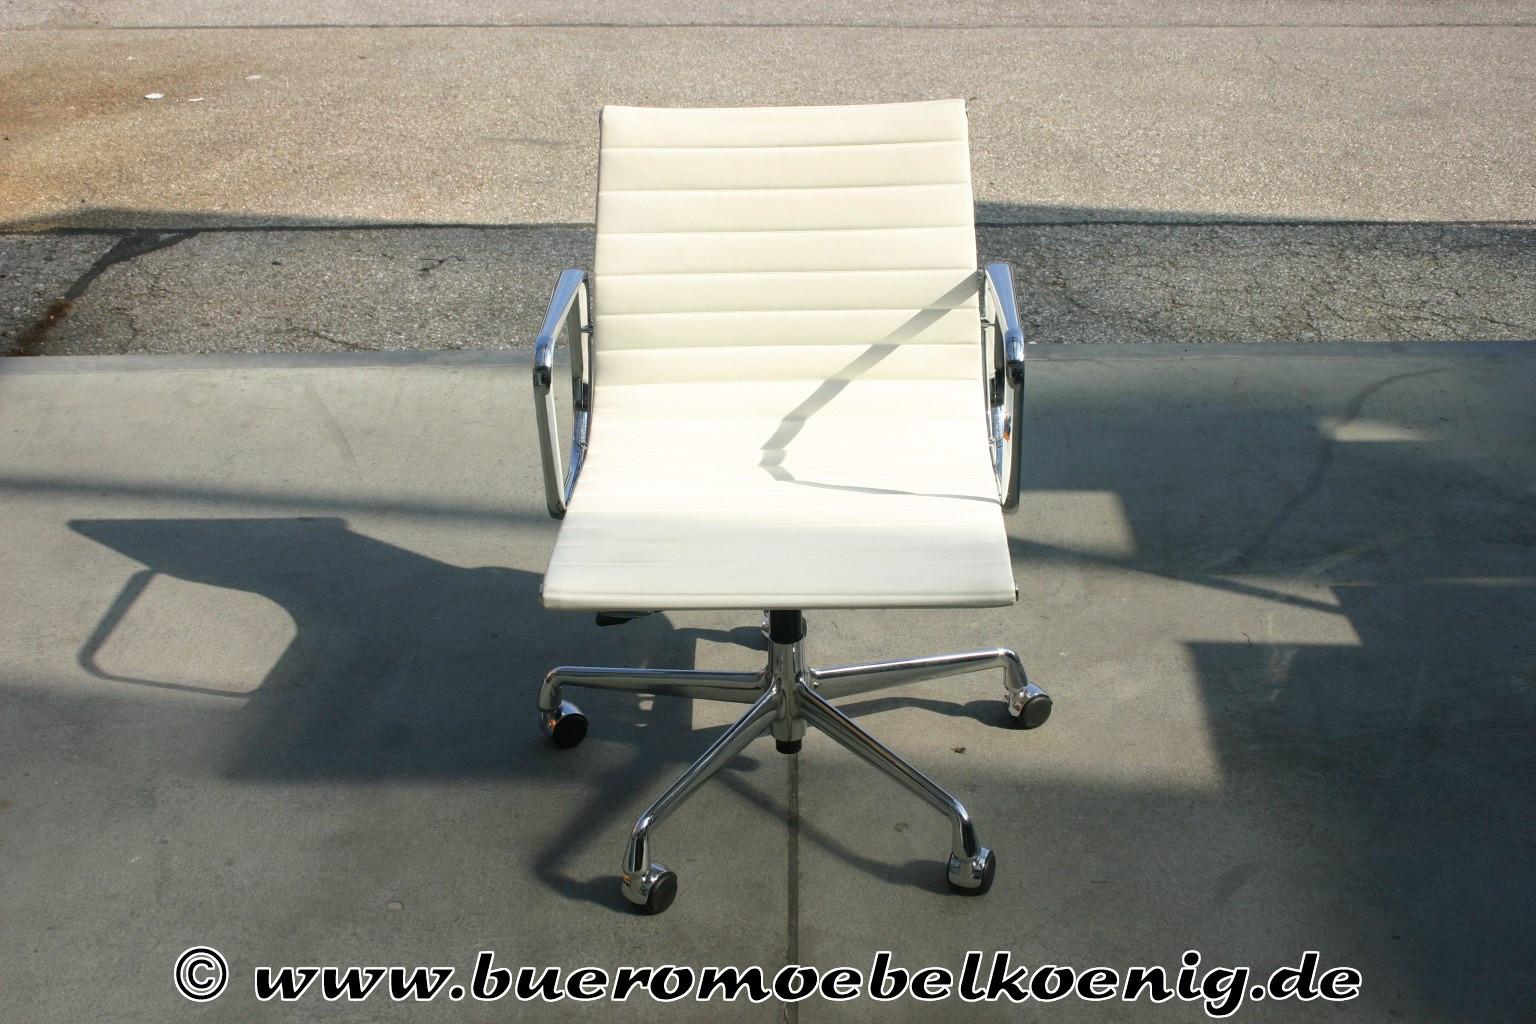 Vitra Chalres Eames : Eleganter aluchair ea in weißem leder von vitra charles eames